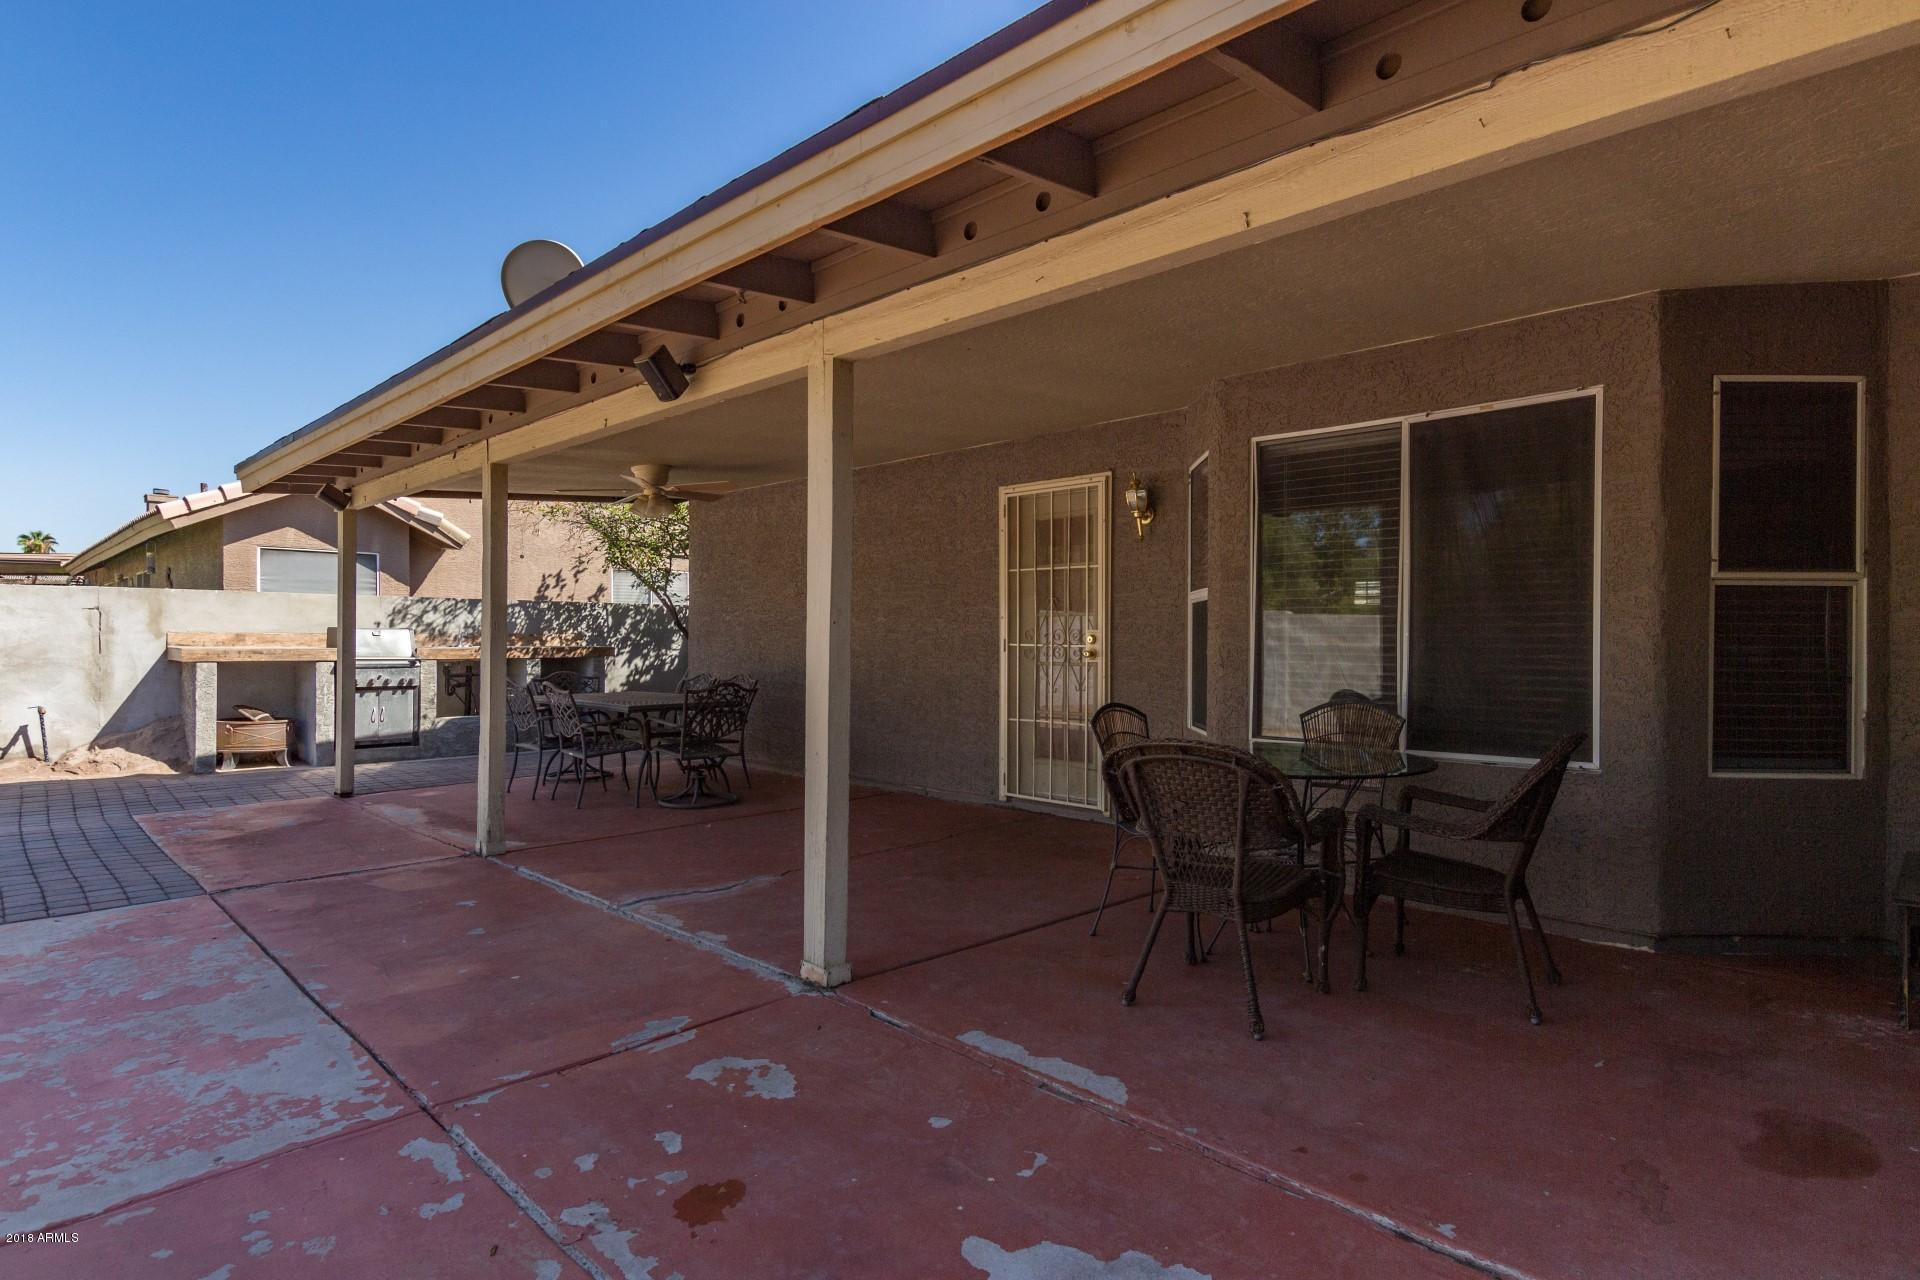 MLS 5824169 438 E CENTURY Avenue, Gilbert, AZ 85296 Gilbert AZ Single-Story